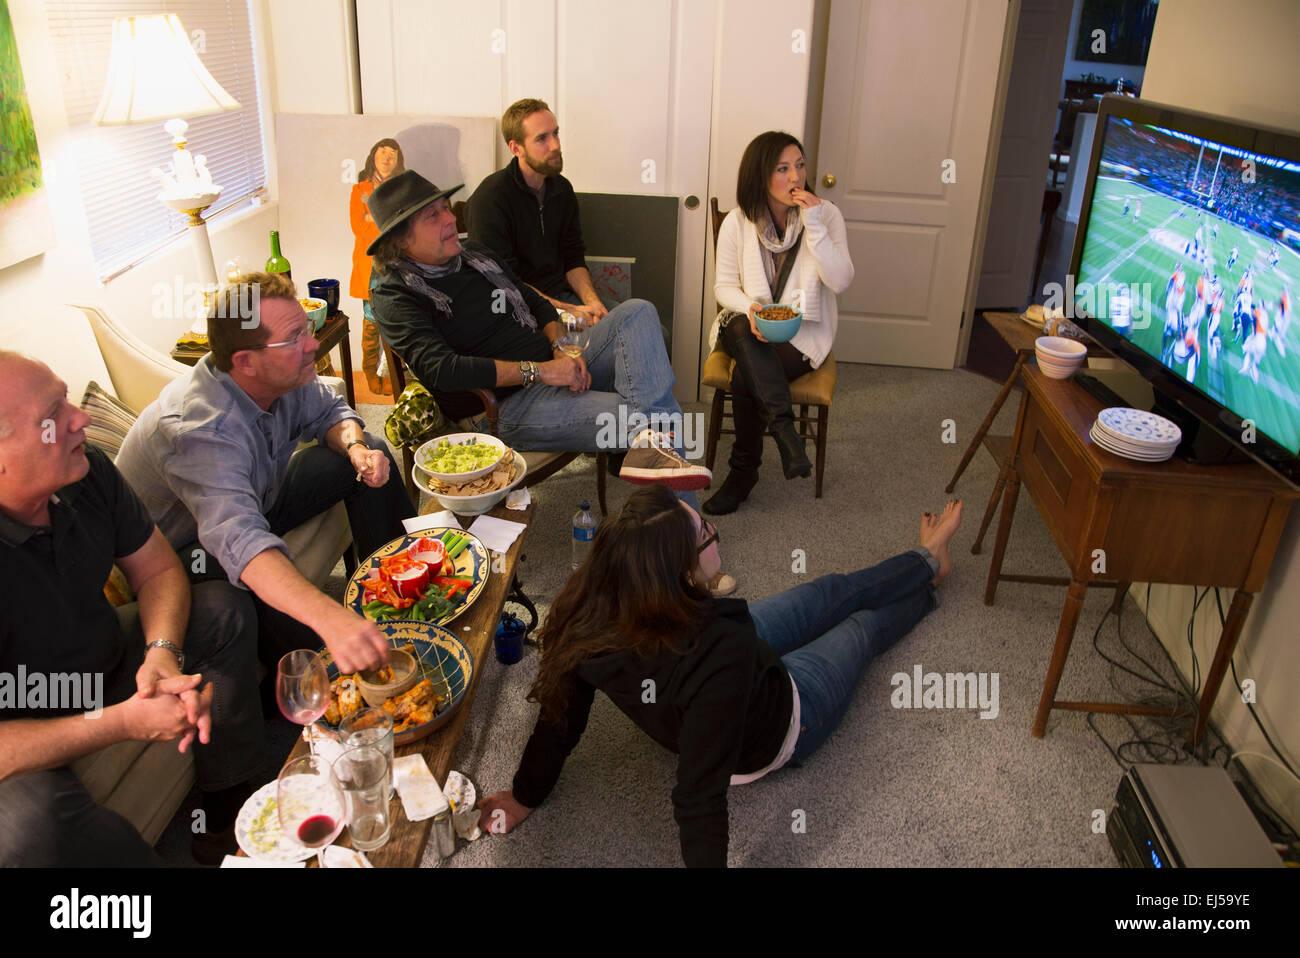 Group of people watch NFL Superbowl XLVIII on television, Feb. 2, 2014, Denver Broncos vs. Seattle Seahwaks - Stock Image